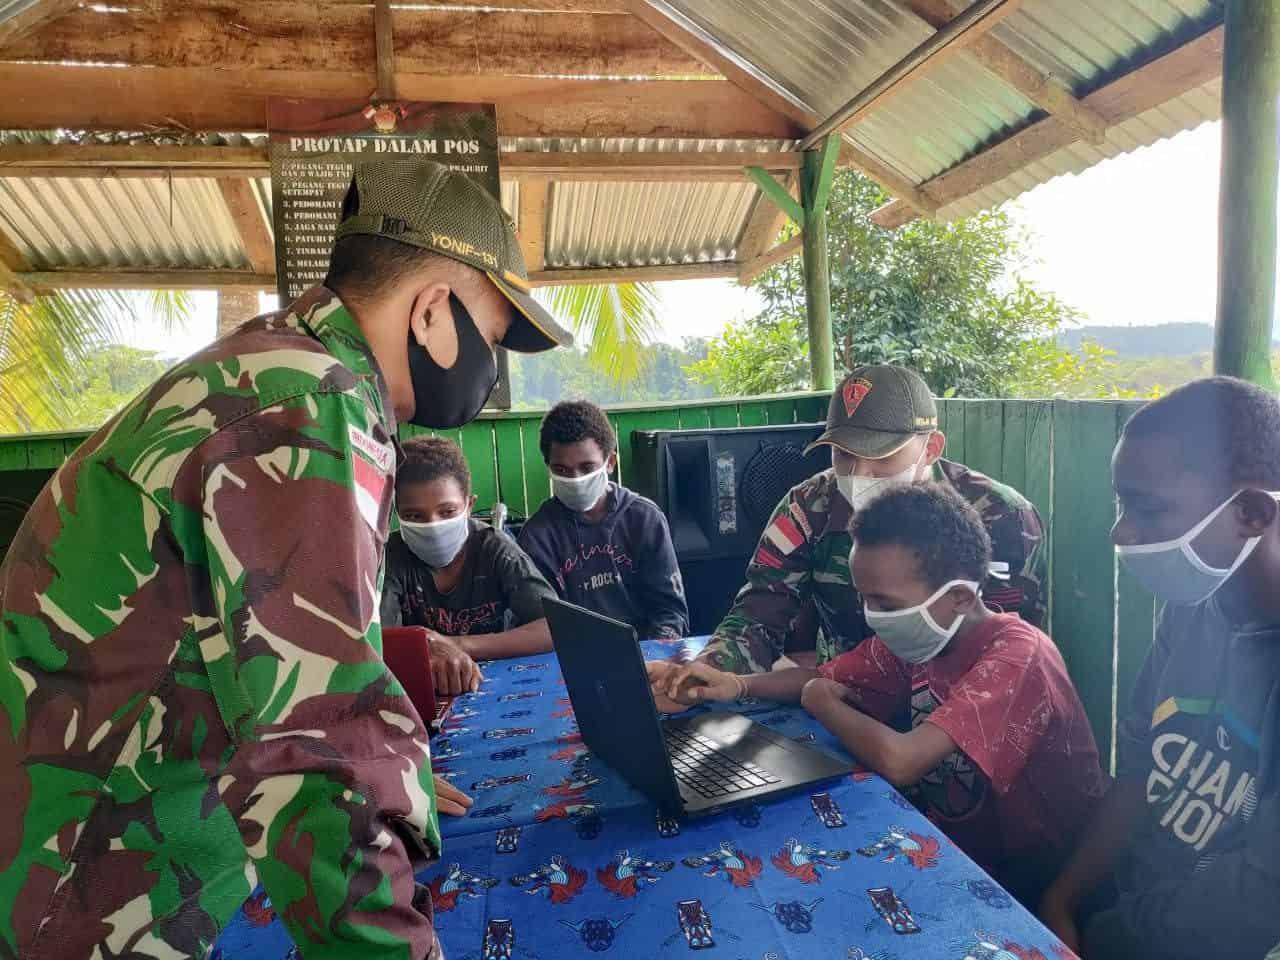 Tingkatkan Pengetahuan Anak Perbatasan, TNI Ajarkan Pengetahuan Komputer di Papua